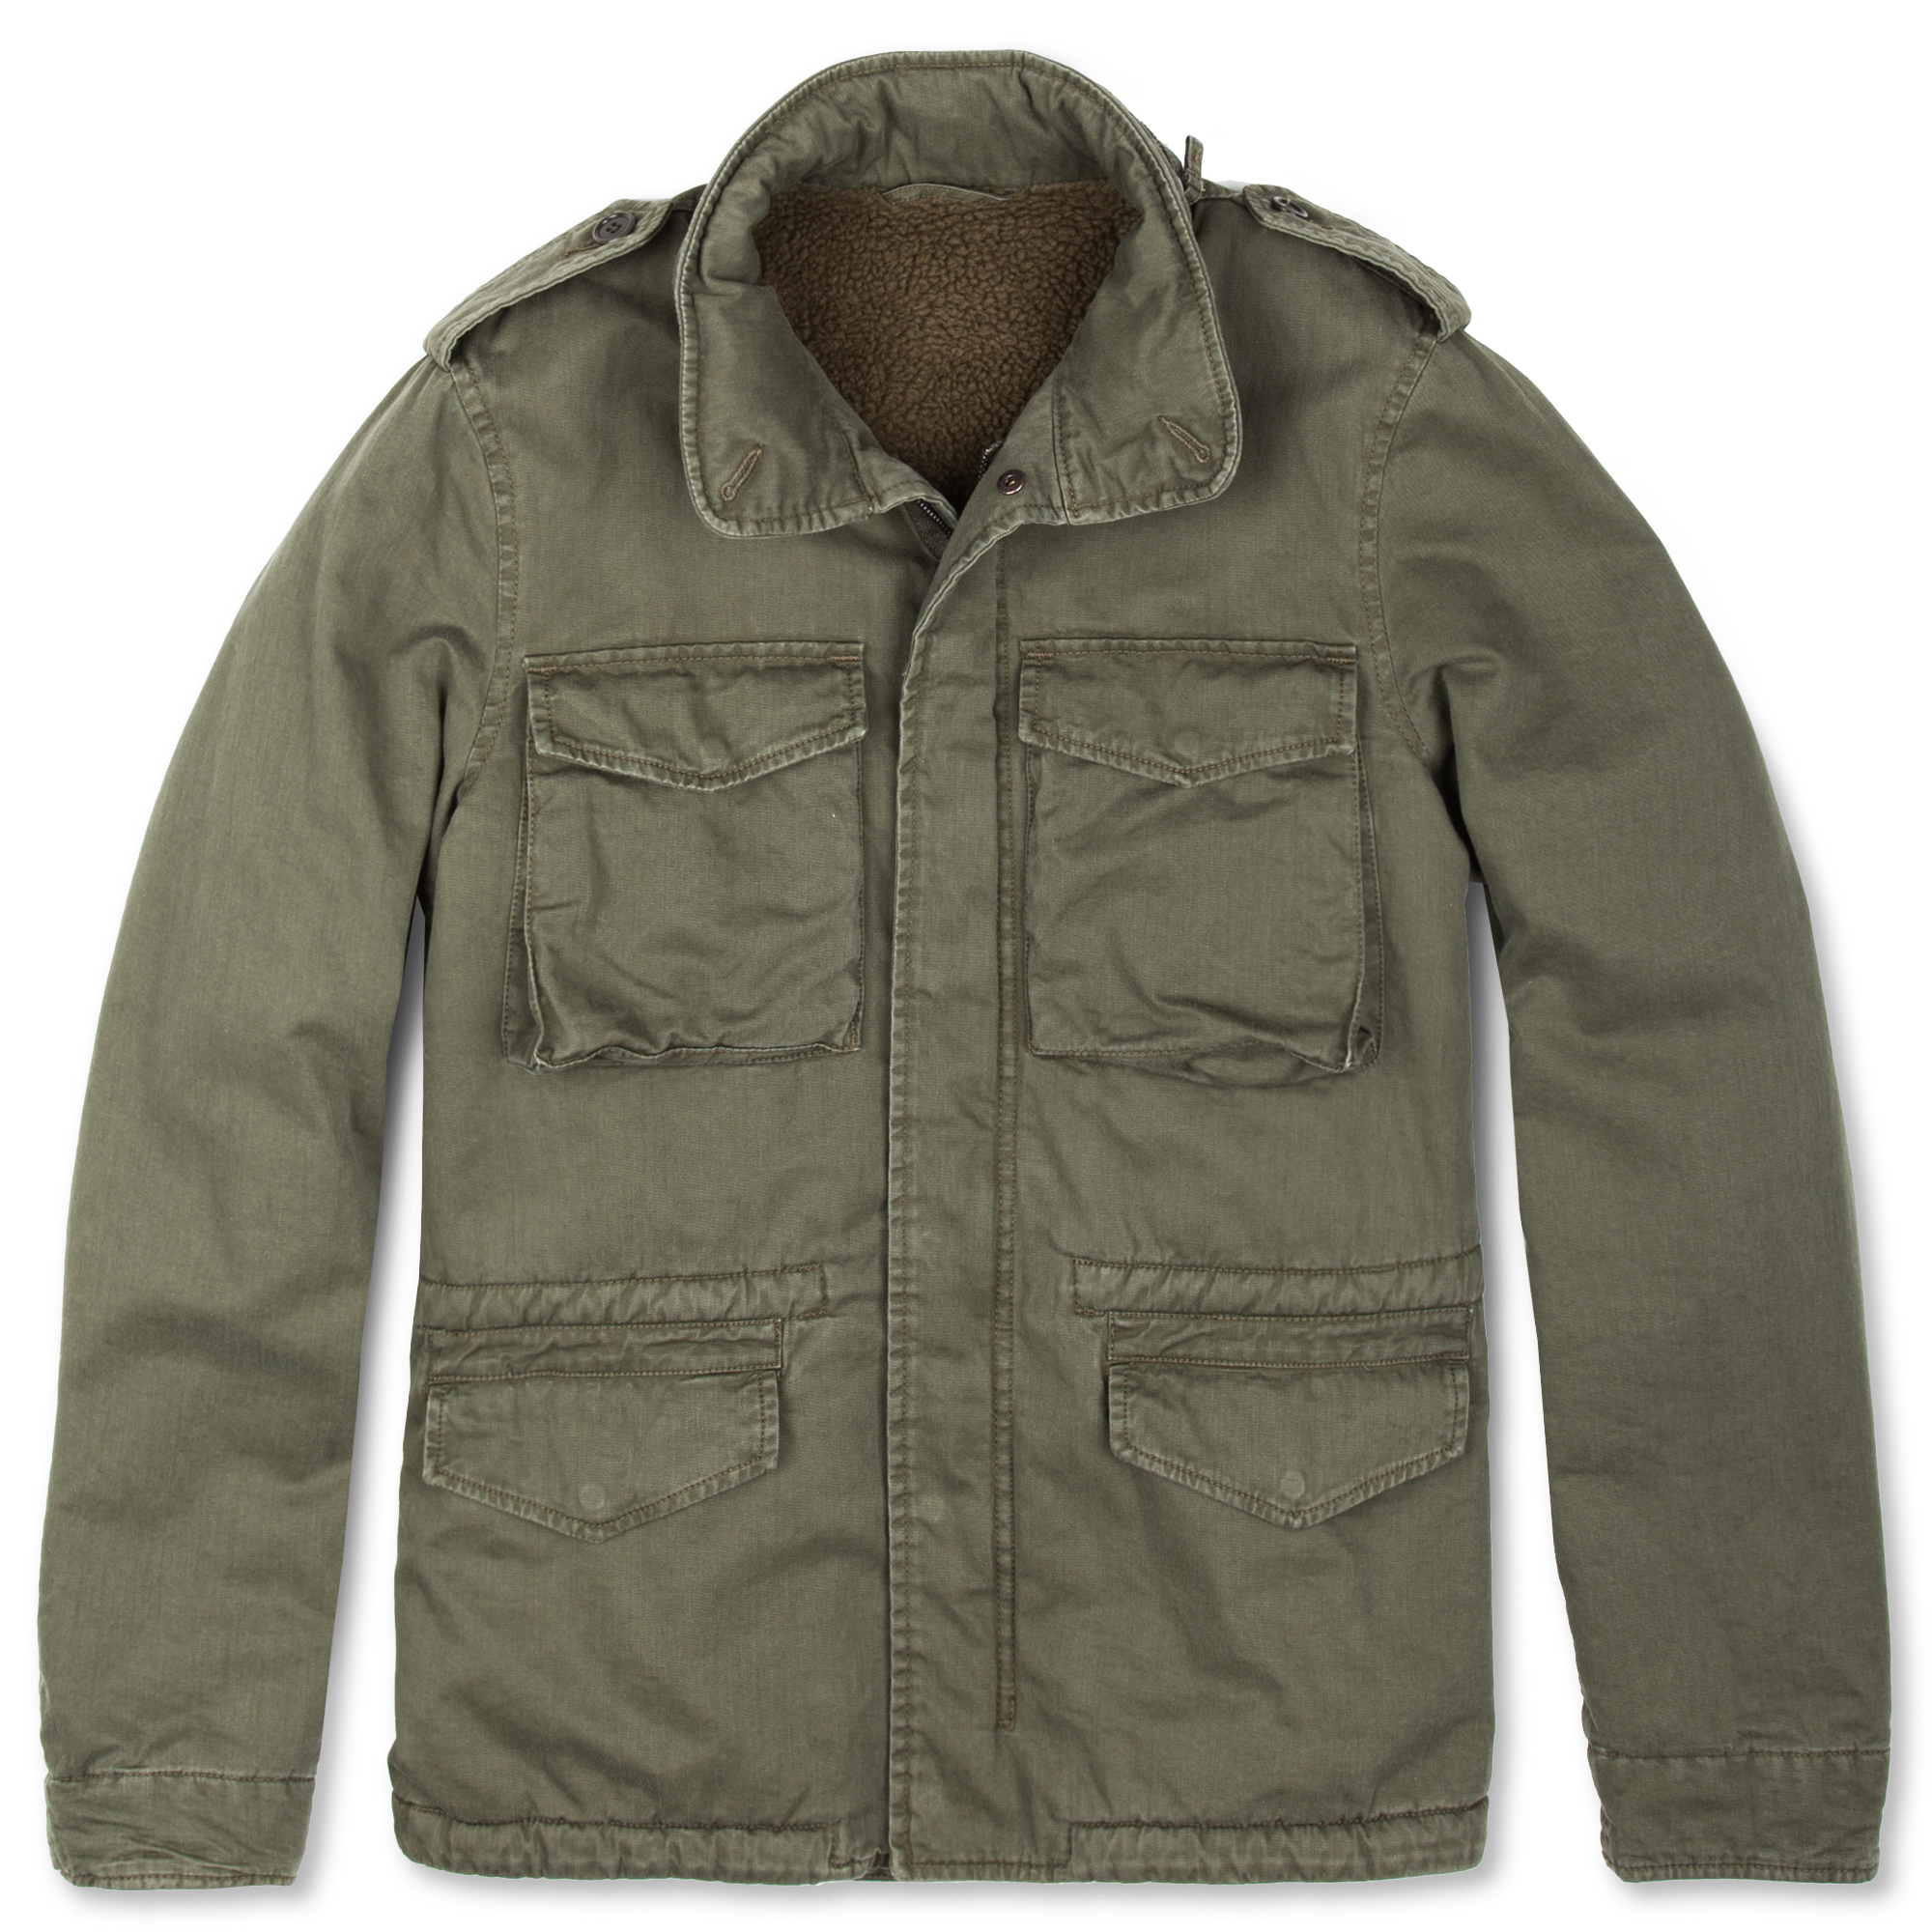 aspesi-military-green-minifield-winter-jacket-product-1-14589499-428877825.jpeg